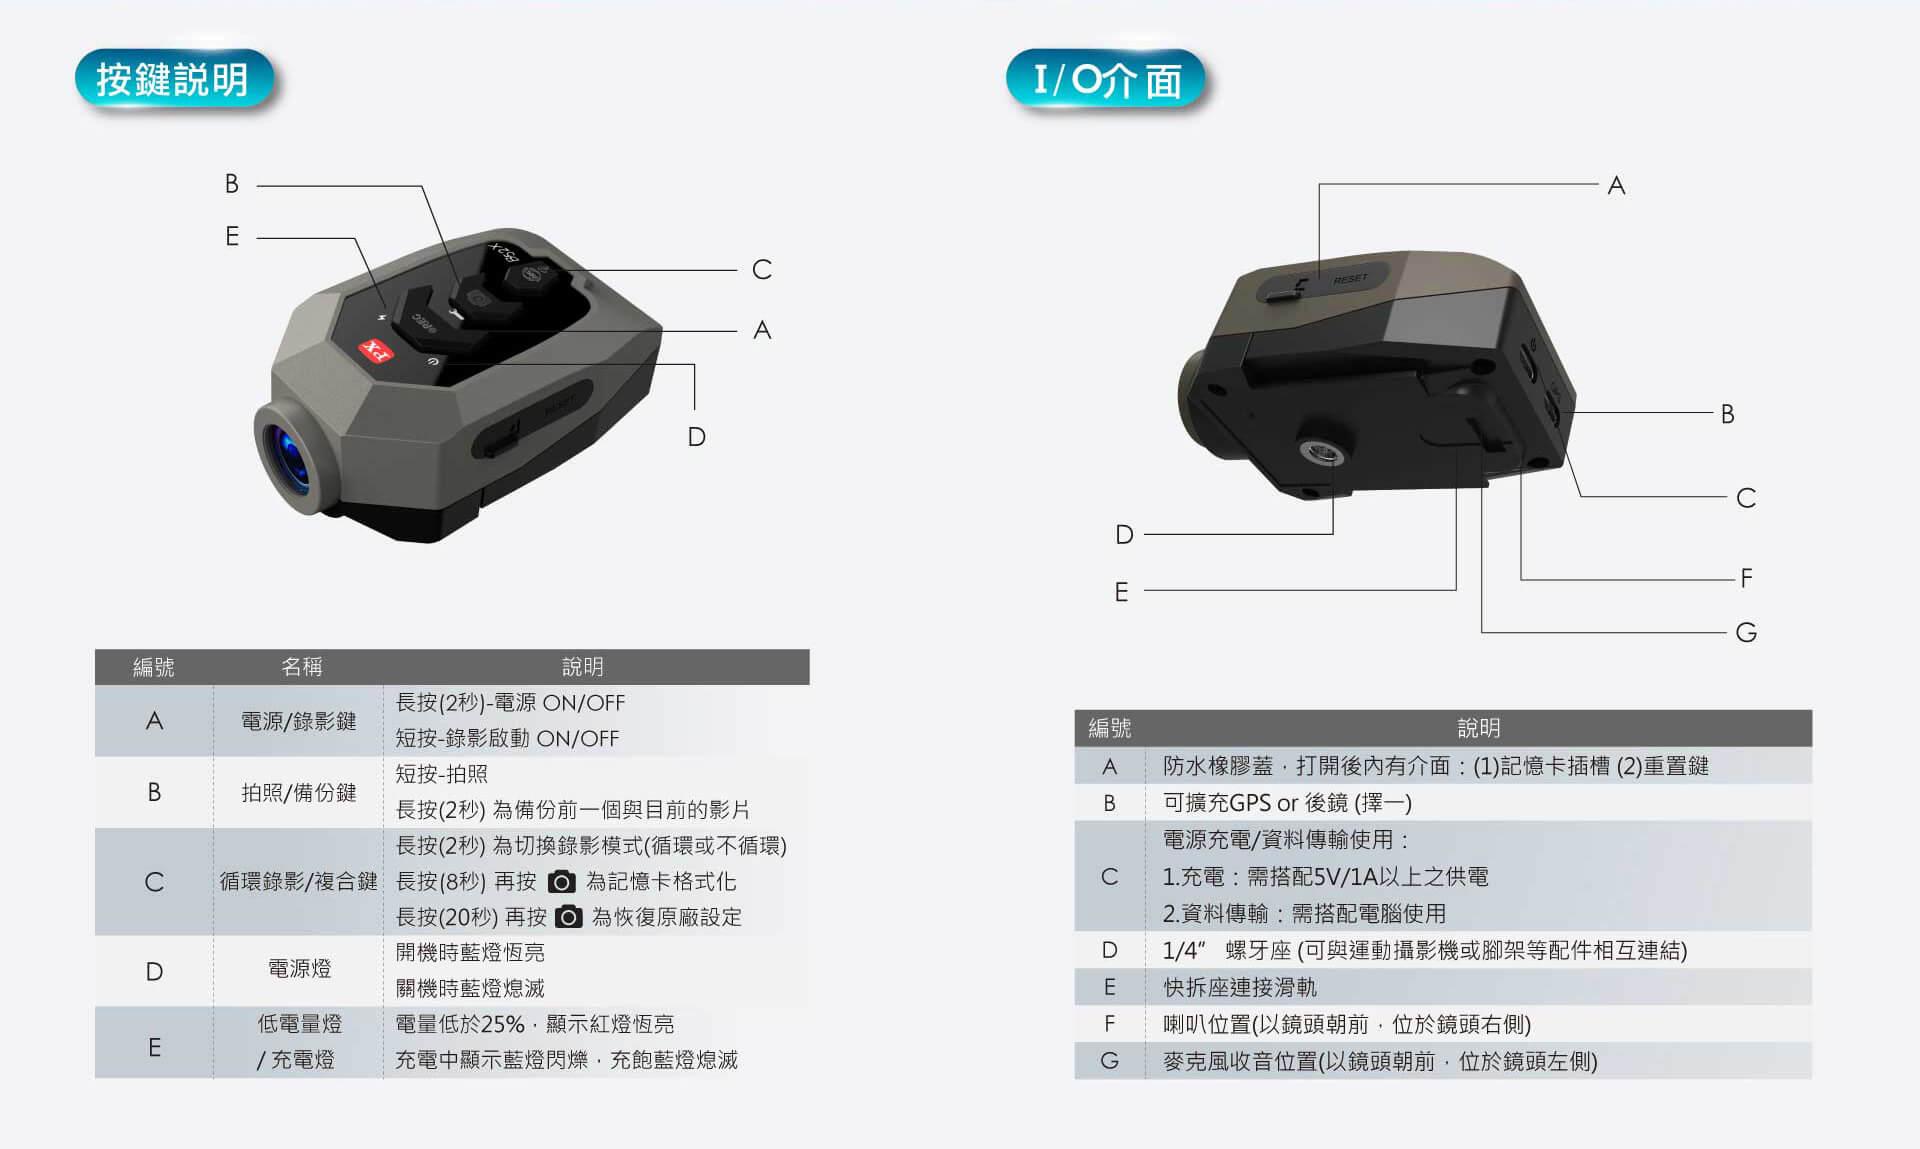 proimages/product/pro-01/pro-01-002/B52X/B52X-22.jpg